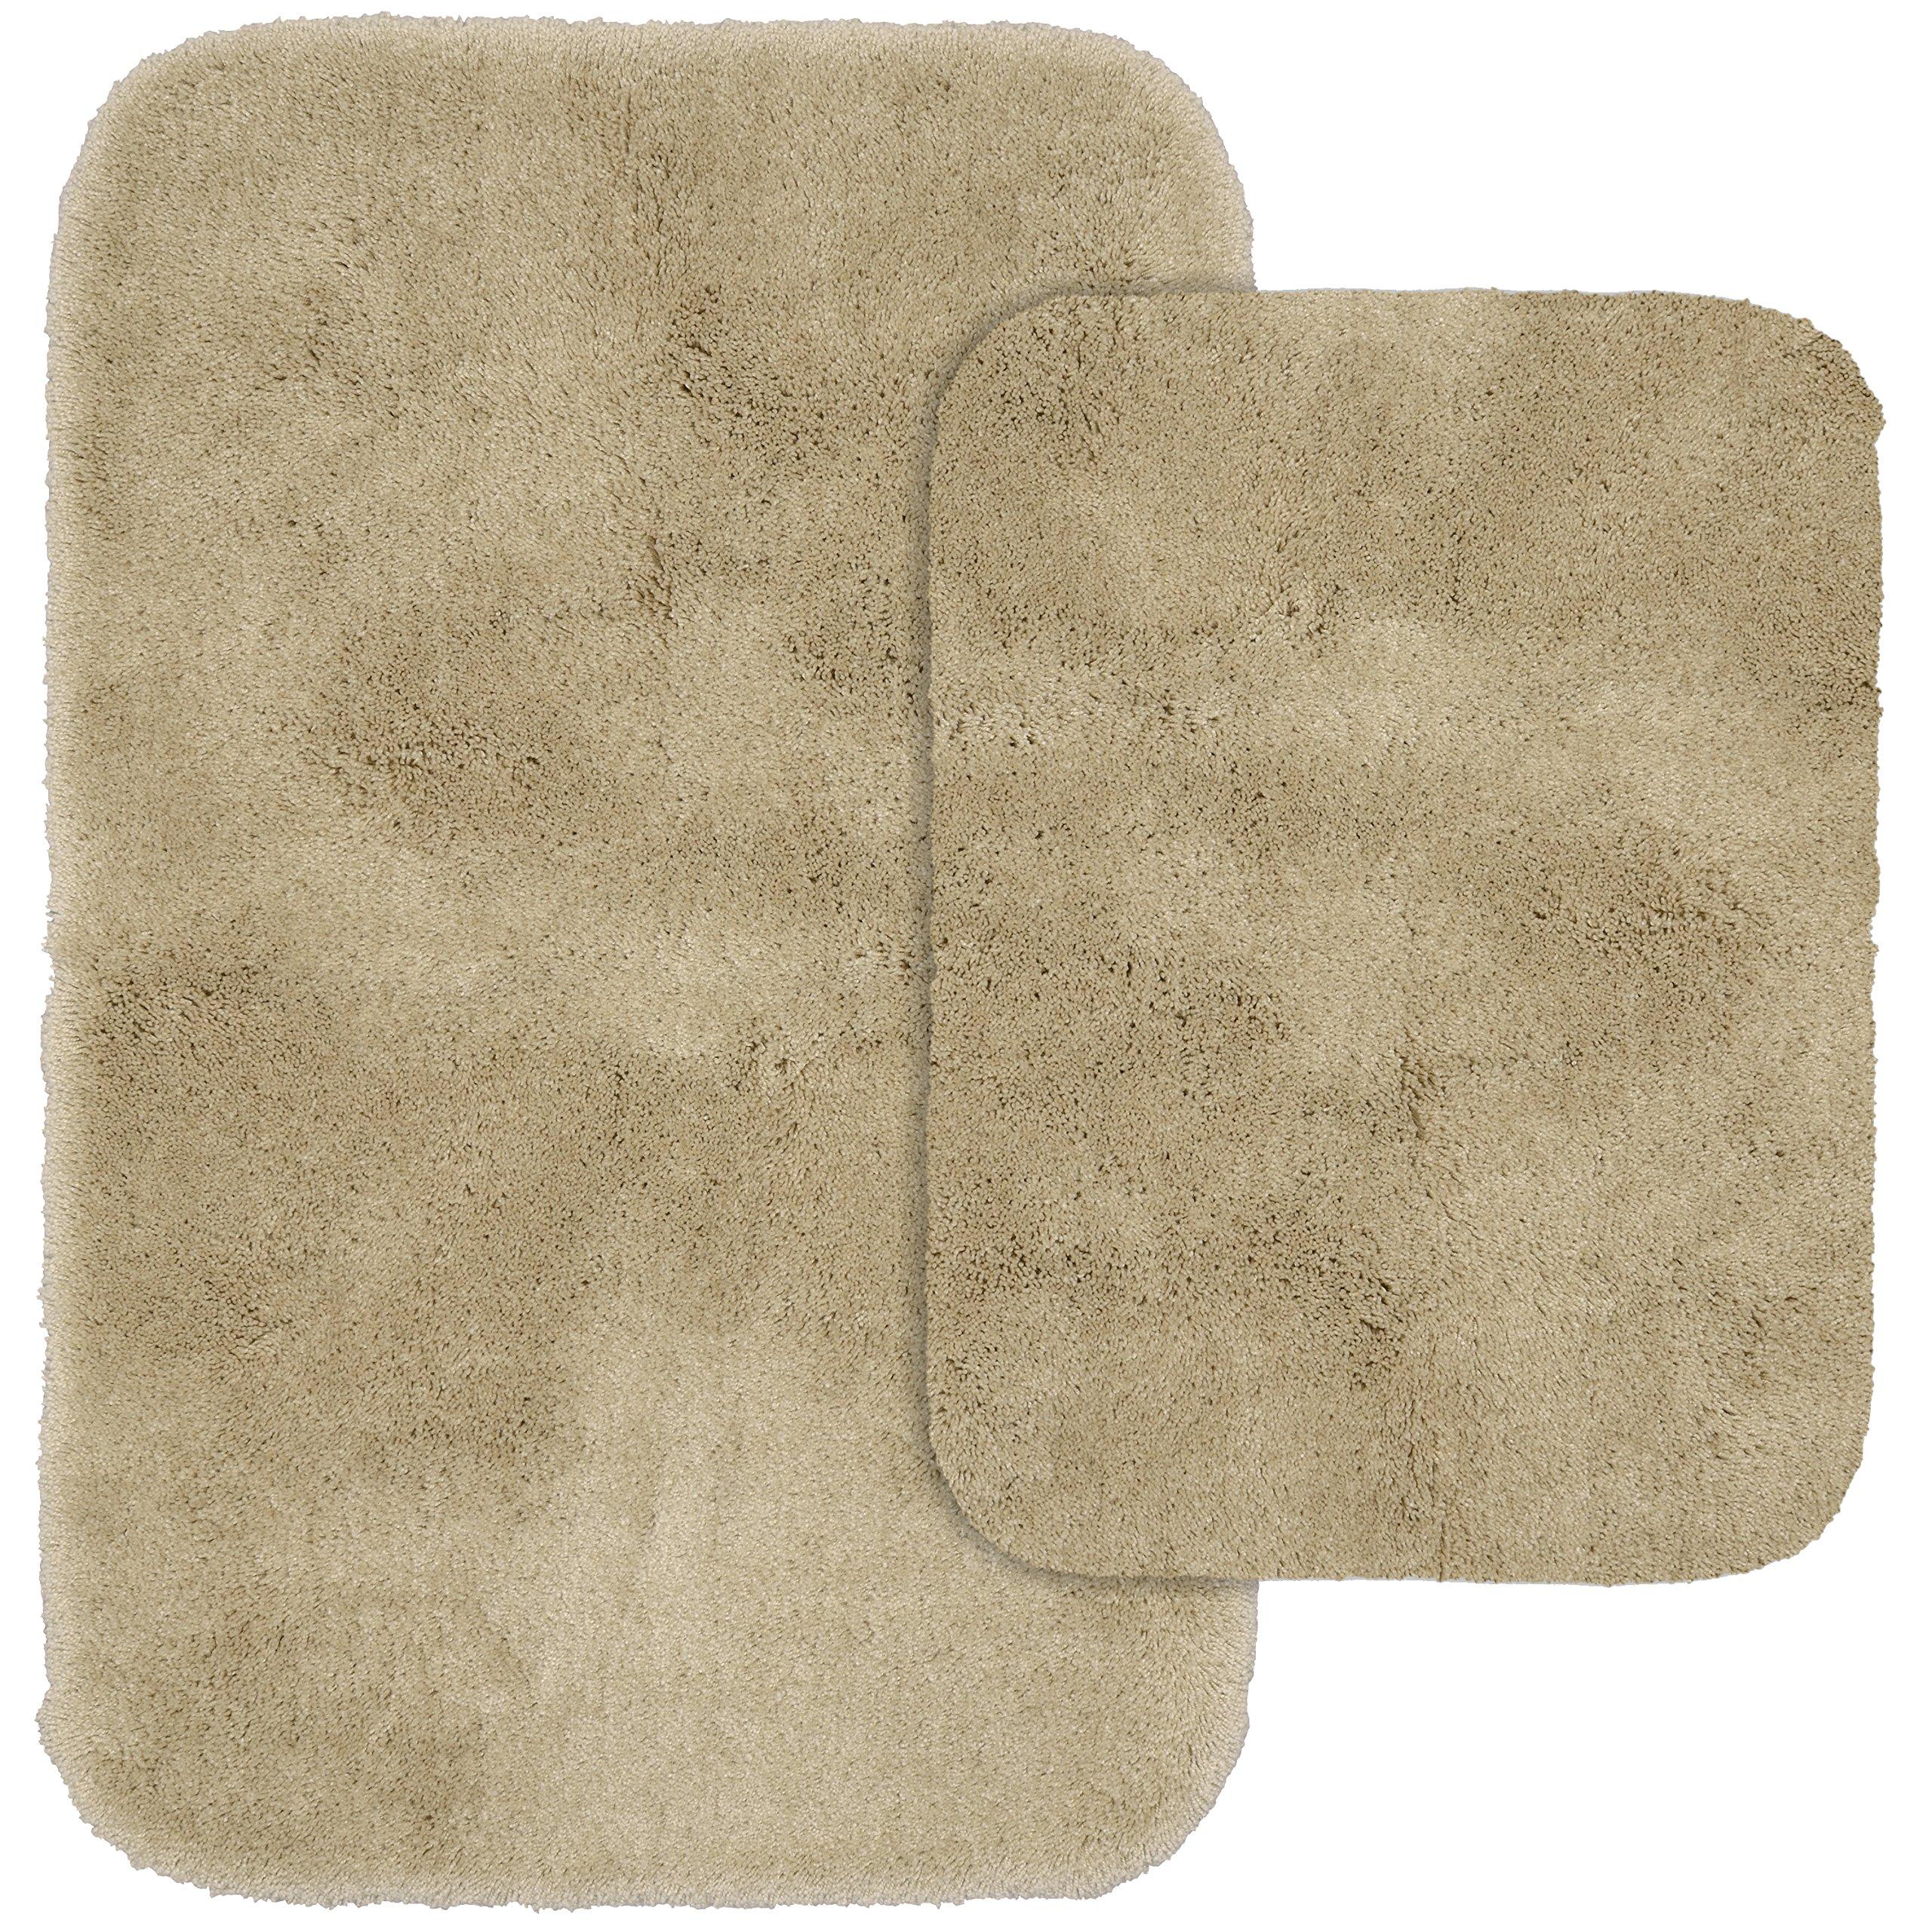 Garland Rug 2-Piece Finest Luxury Ultra Plush Washable Nylon Bathroom Rug Set, Linen